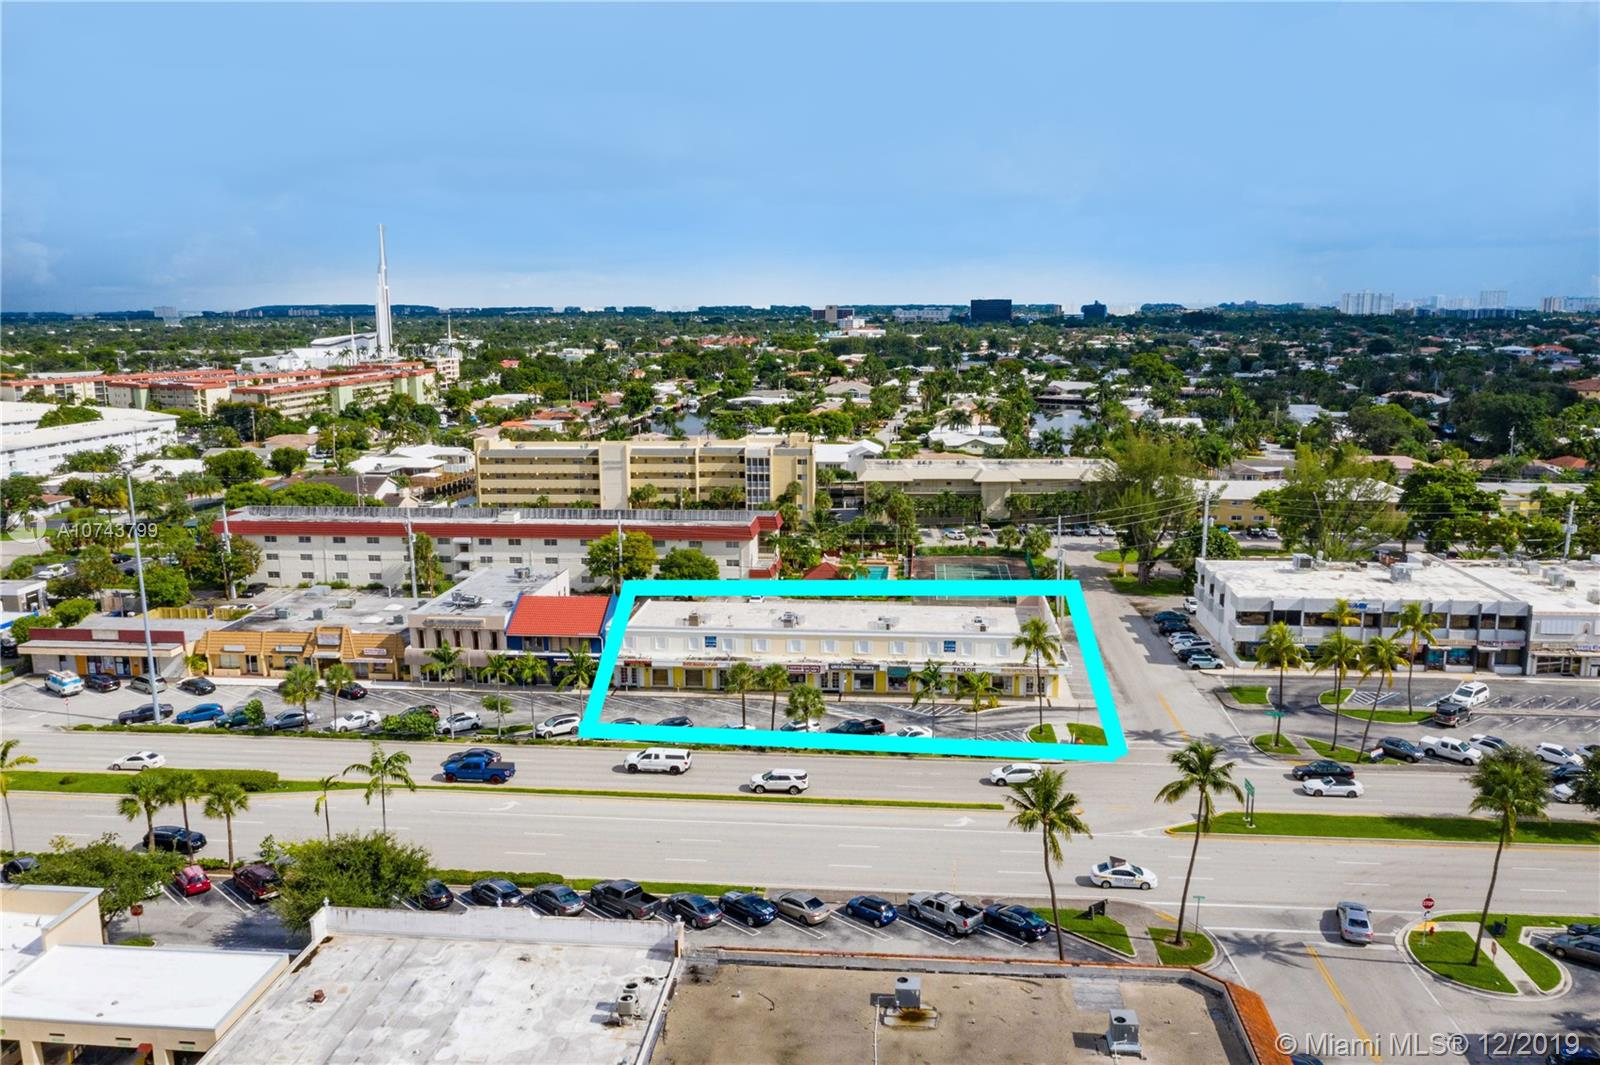 2701-2715 E Commercial Blvd, Fort Lauderdale, FL 33308